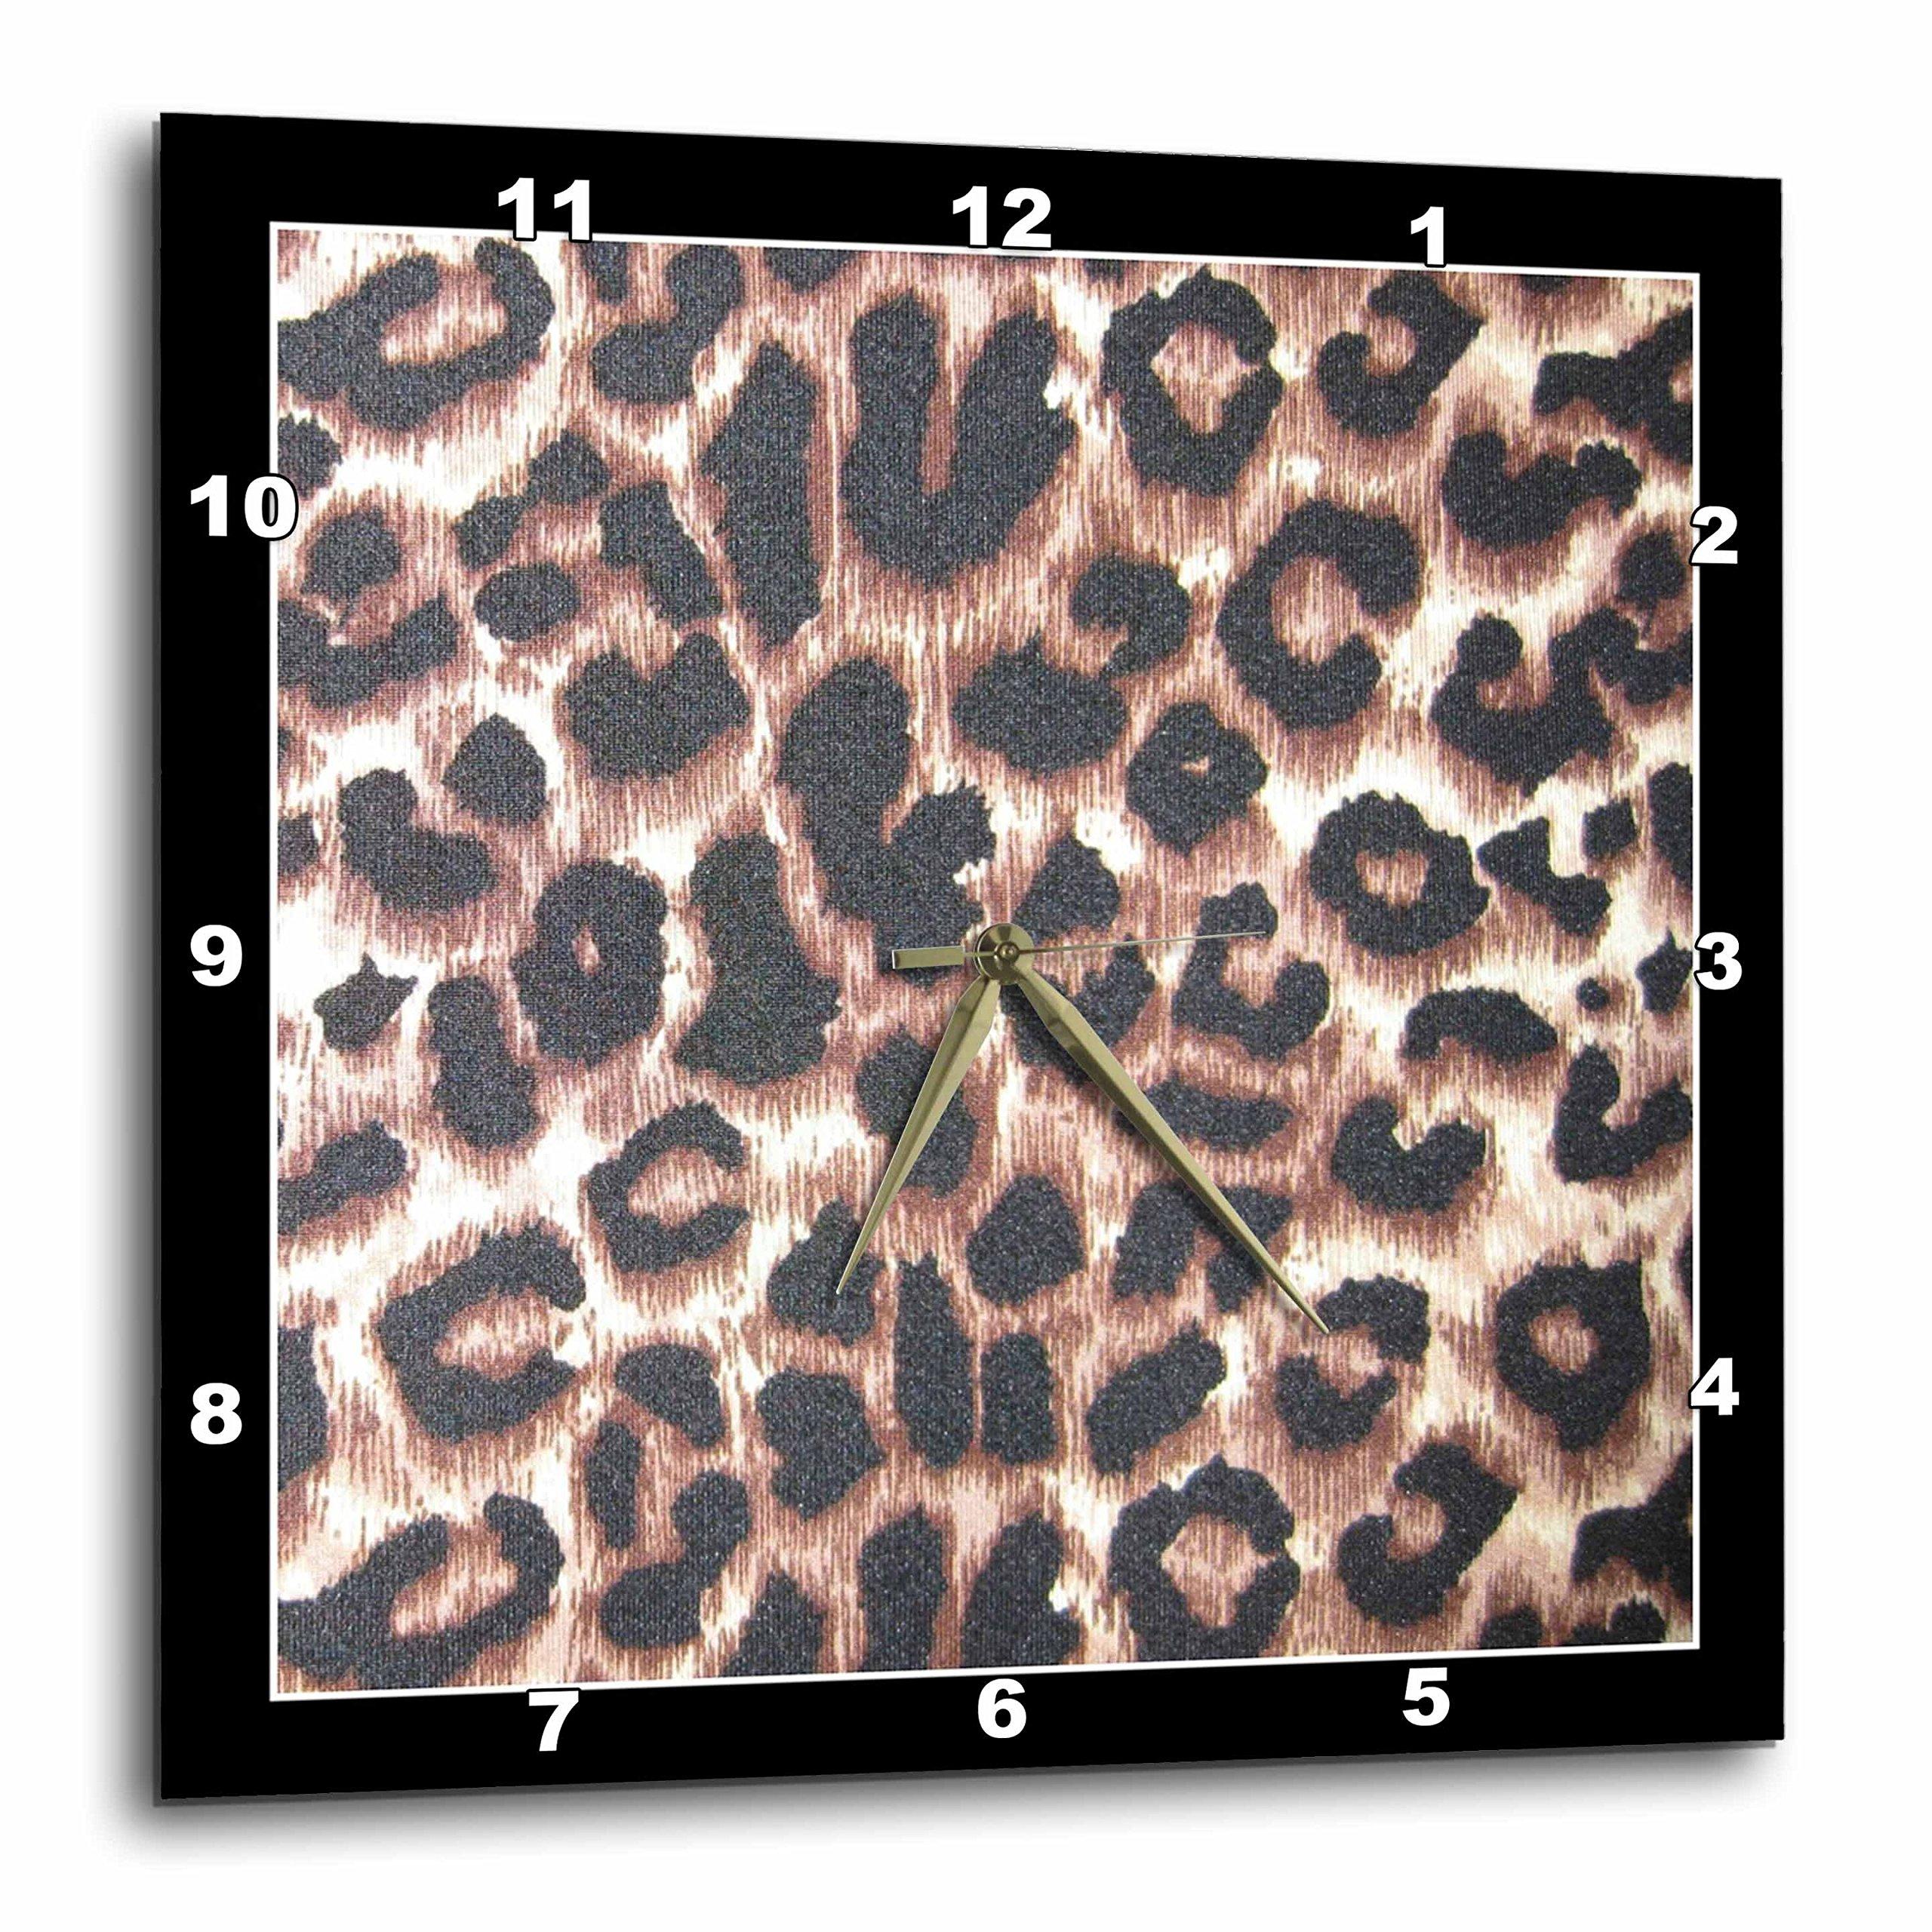 3D Rose dpp_30873_2 3dRose Black Frame Leopard Animal Prints-Wall Clock 13-inch